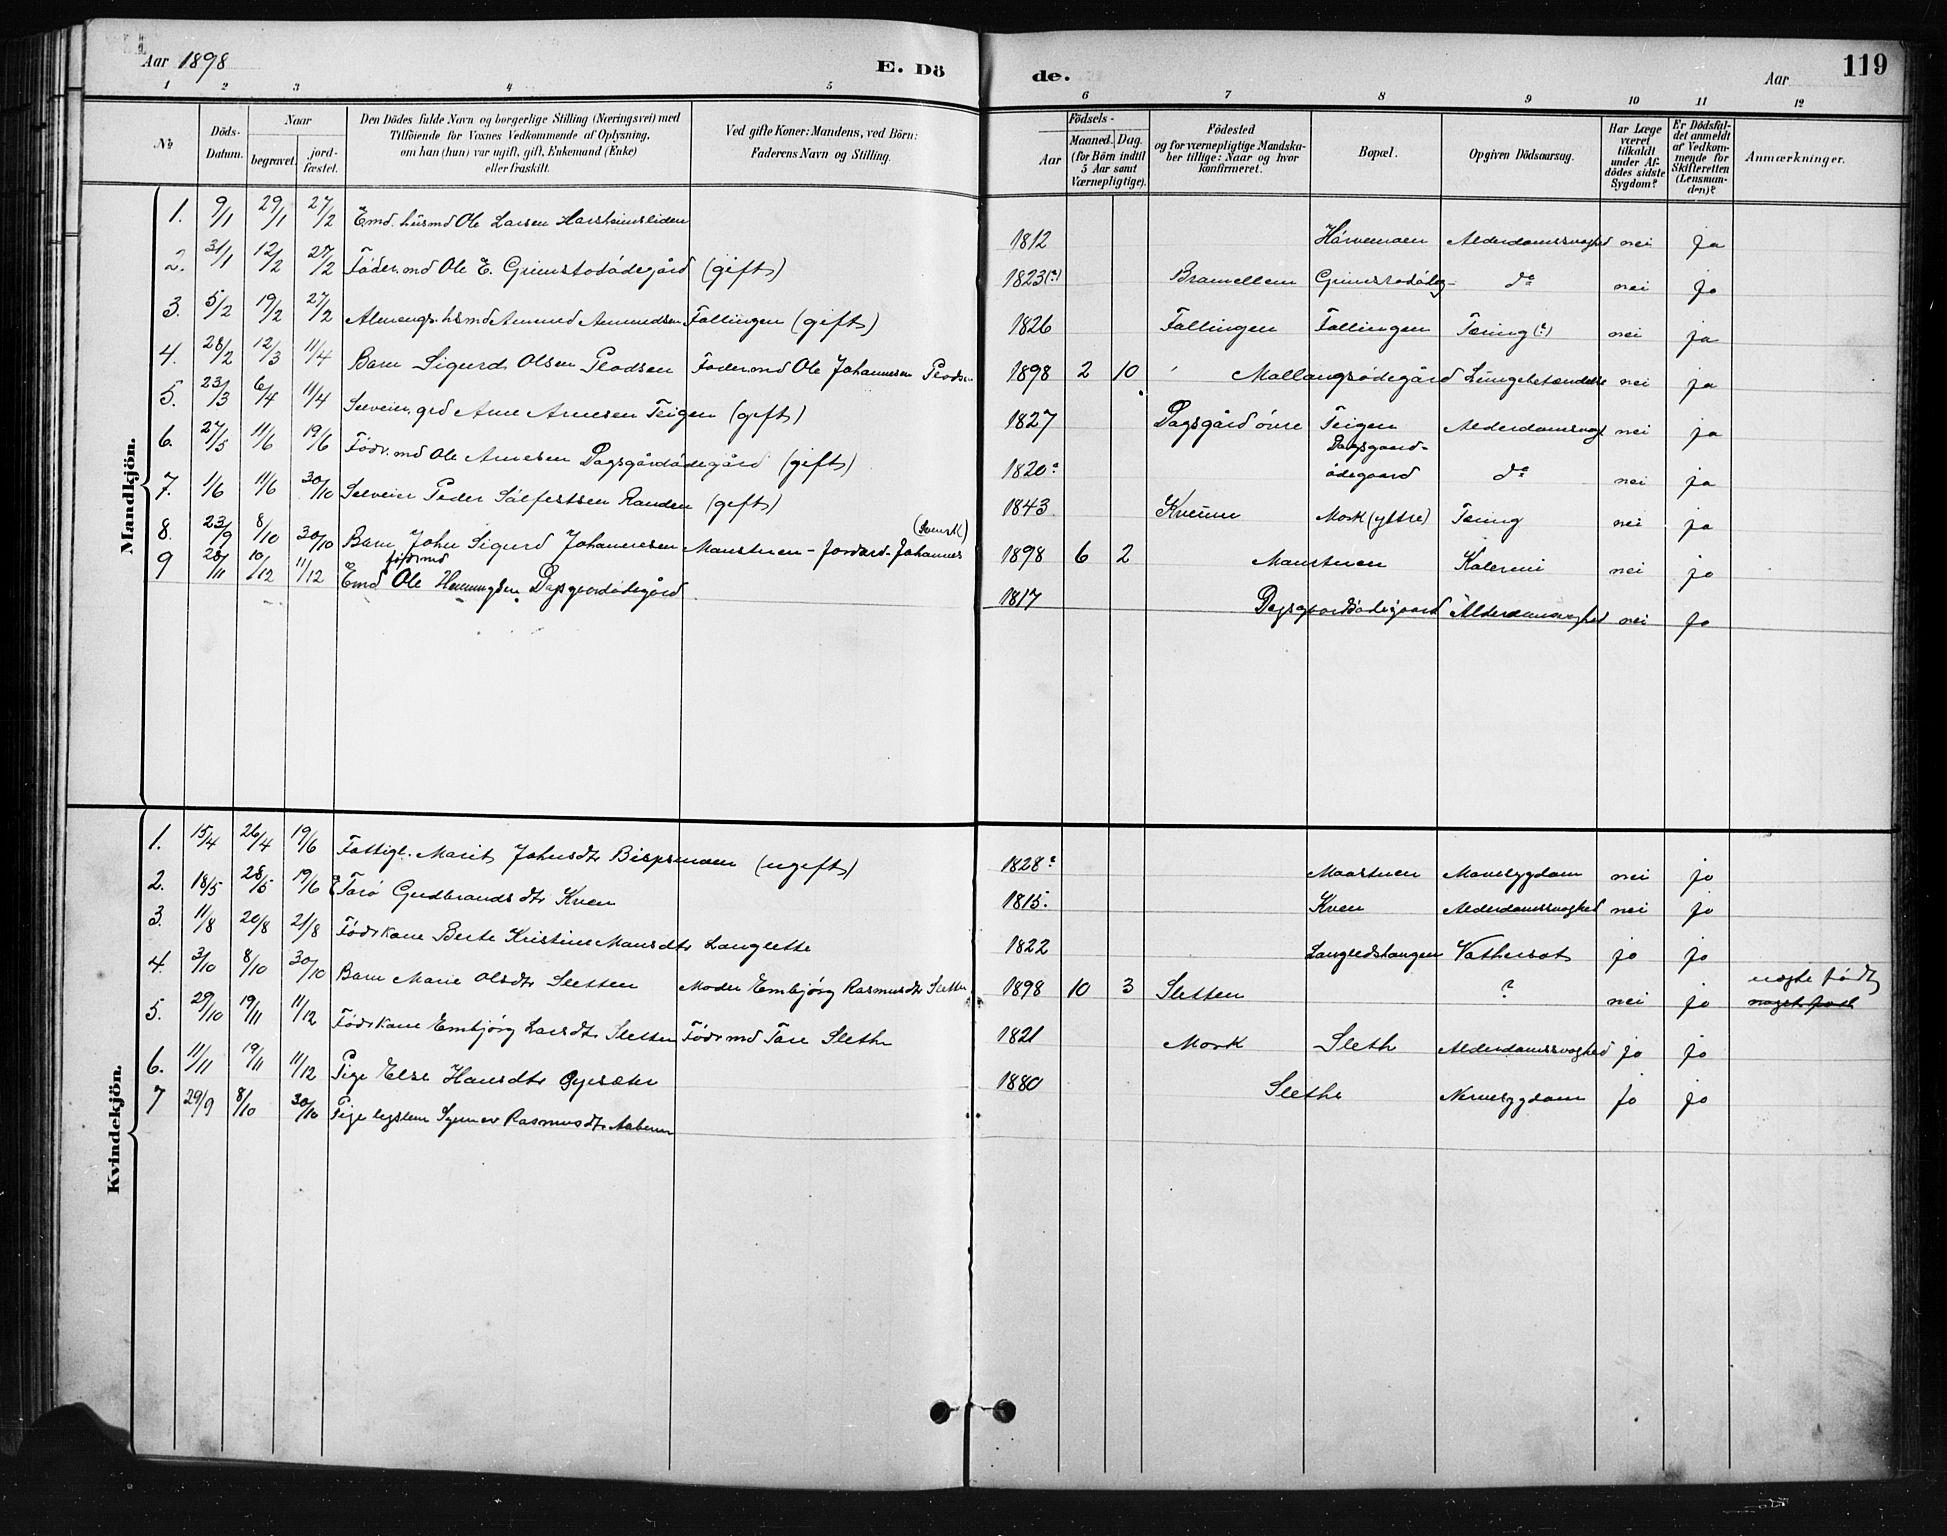 SAH, Skjåk prestekontor, Klokkerbok nr. 4, 1895-1921, s. 119